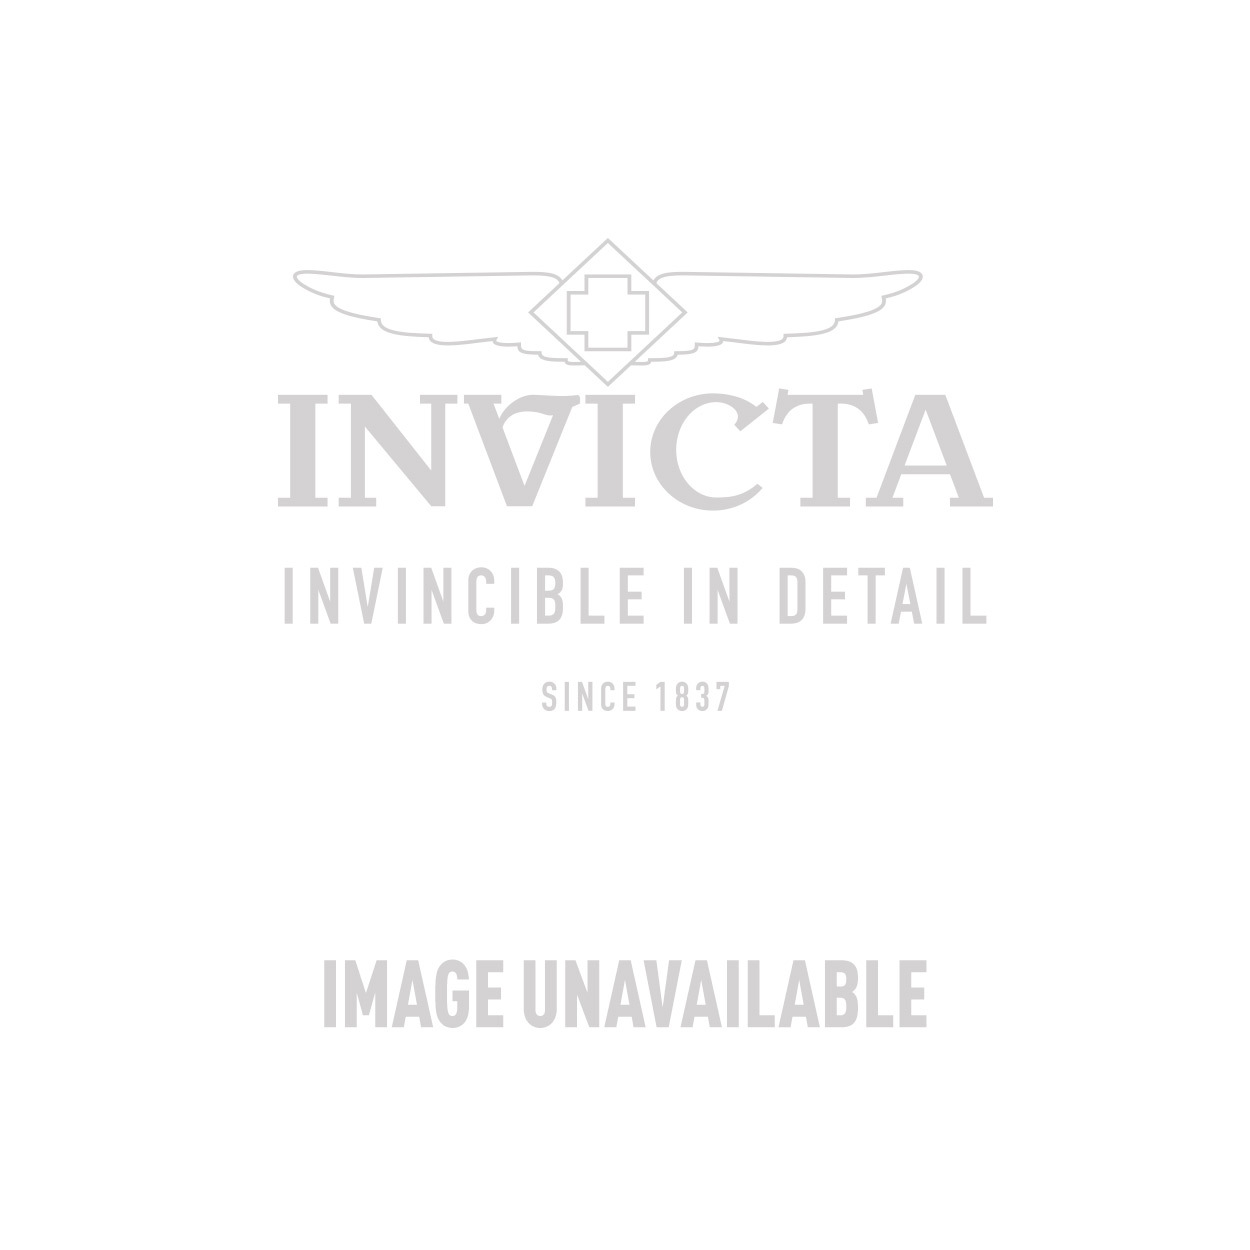 1fb4449f7869 Invicta Star Wars Limited Edition Boba Fett Mens Quartz 52 mm Green